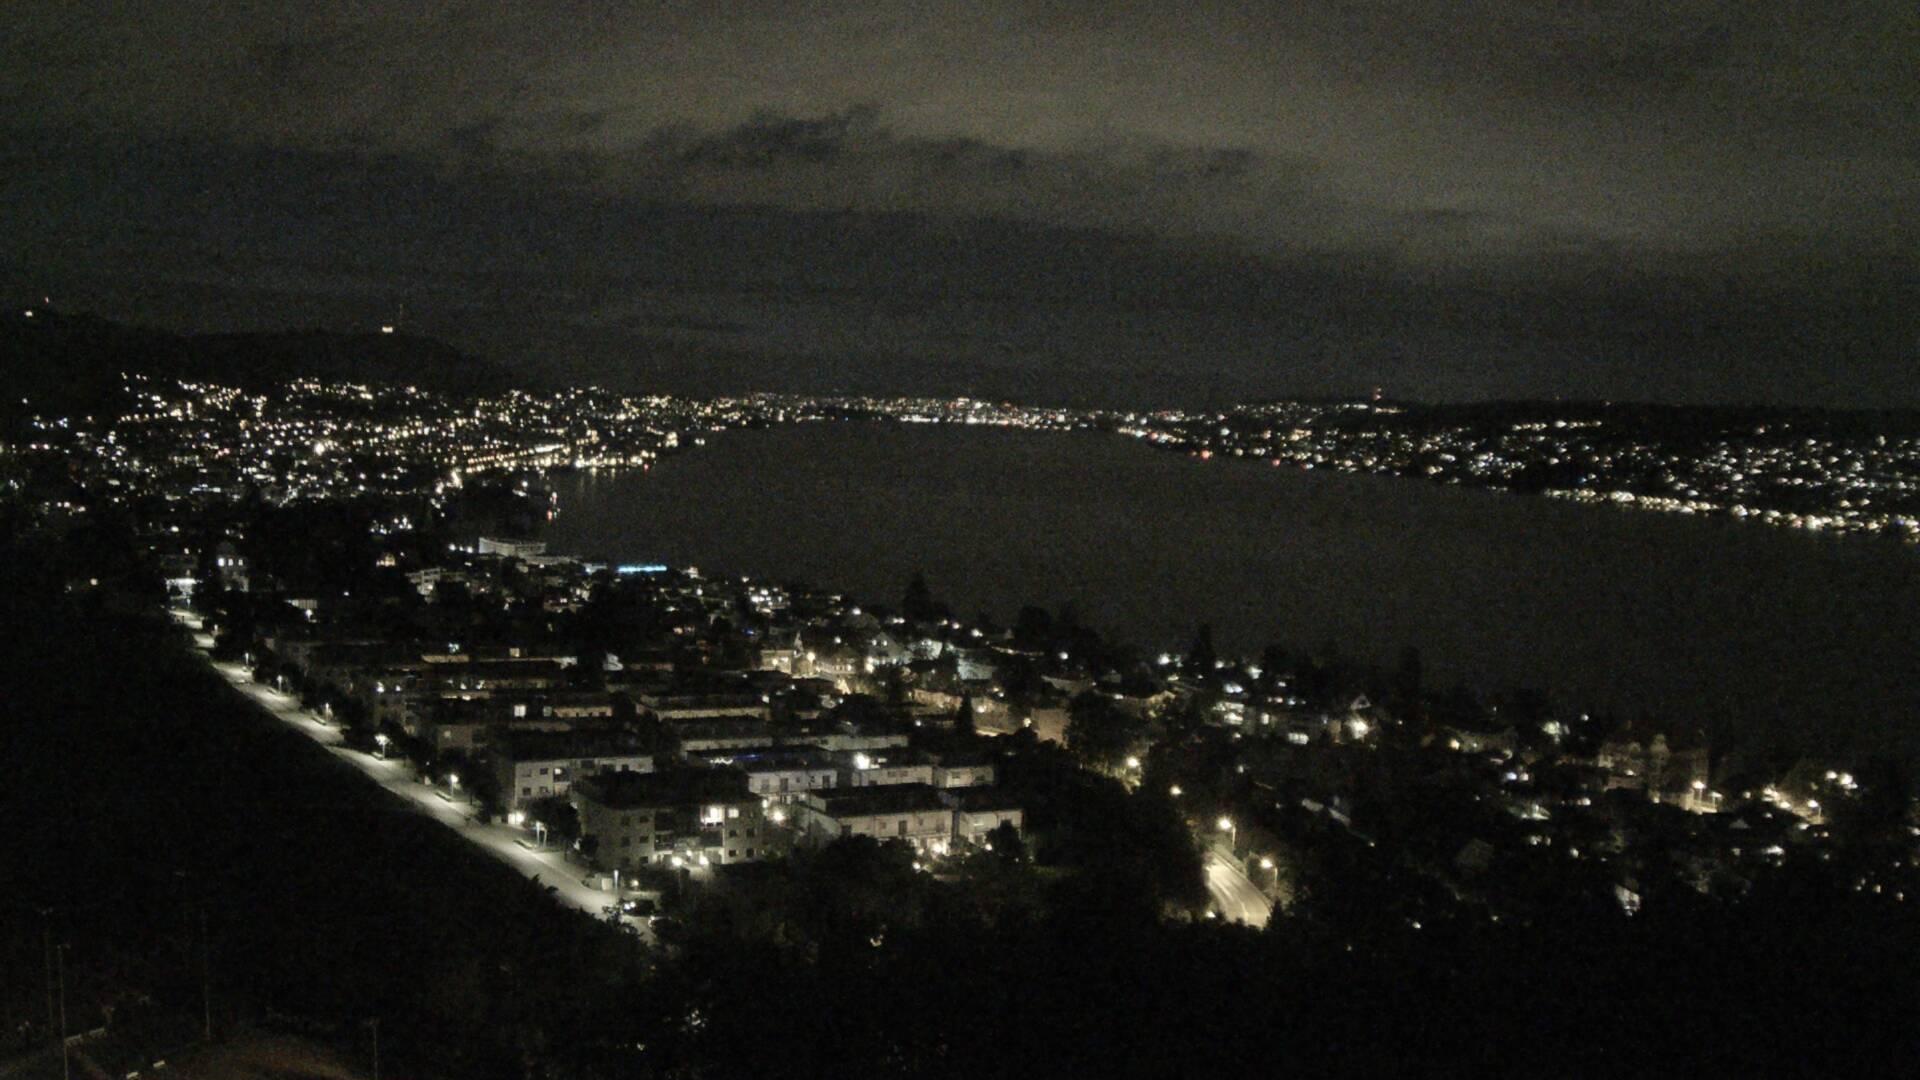 Horgen Richtung Zürich